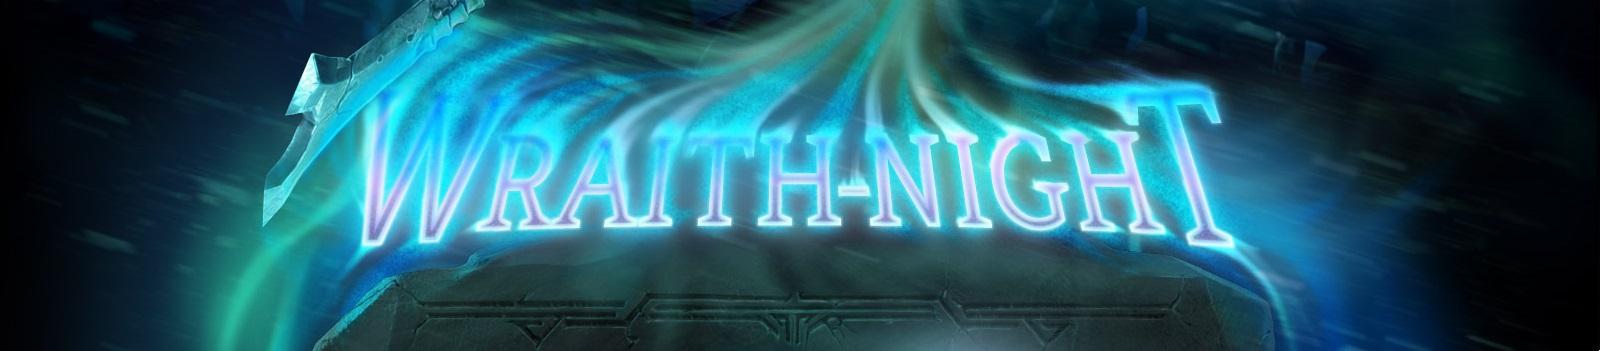 Wraith-Night.jpg